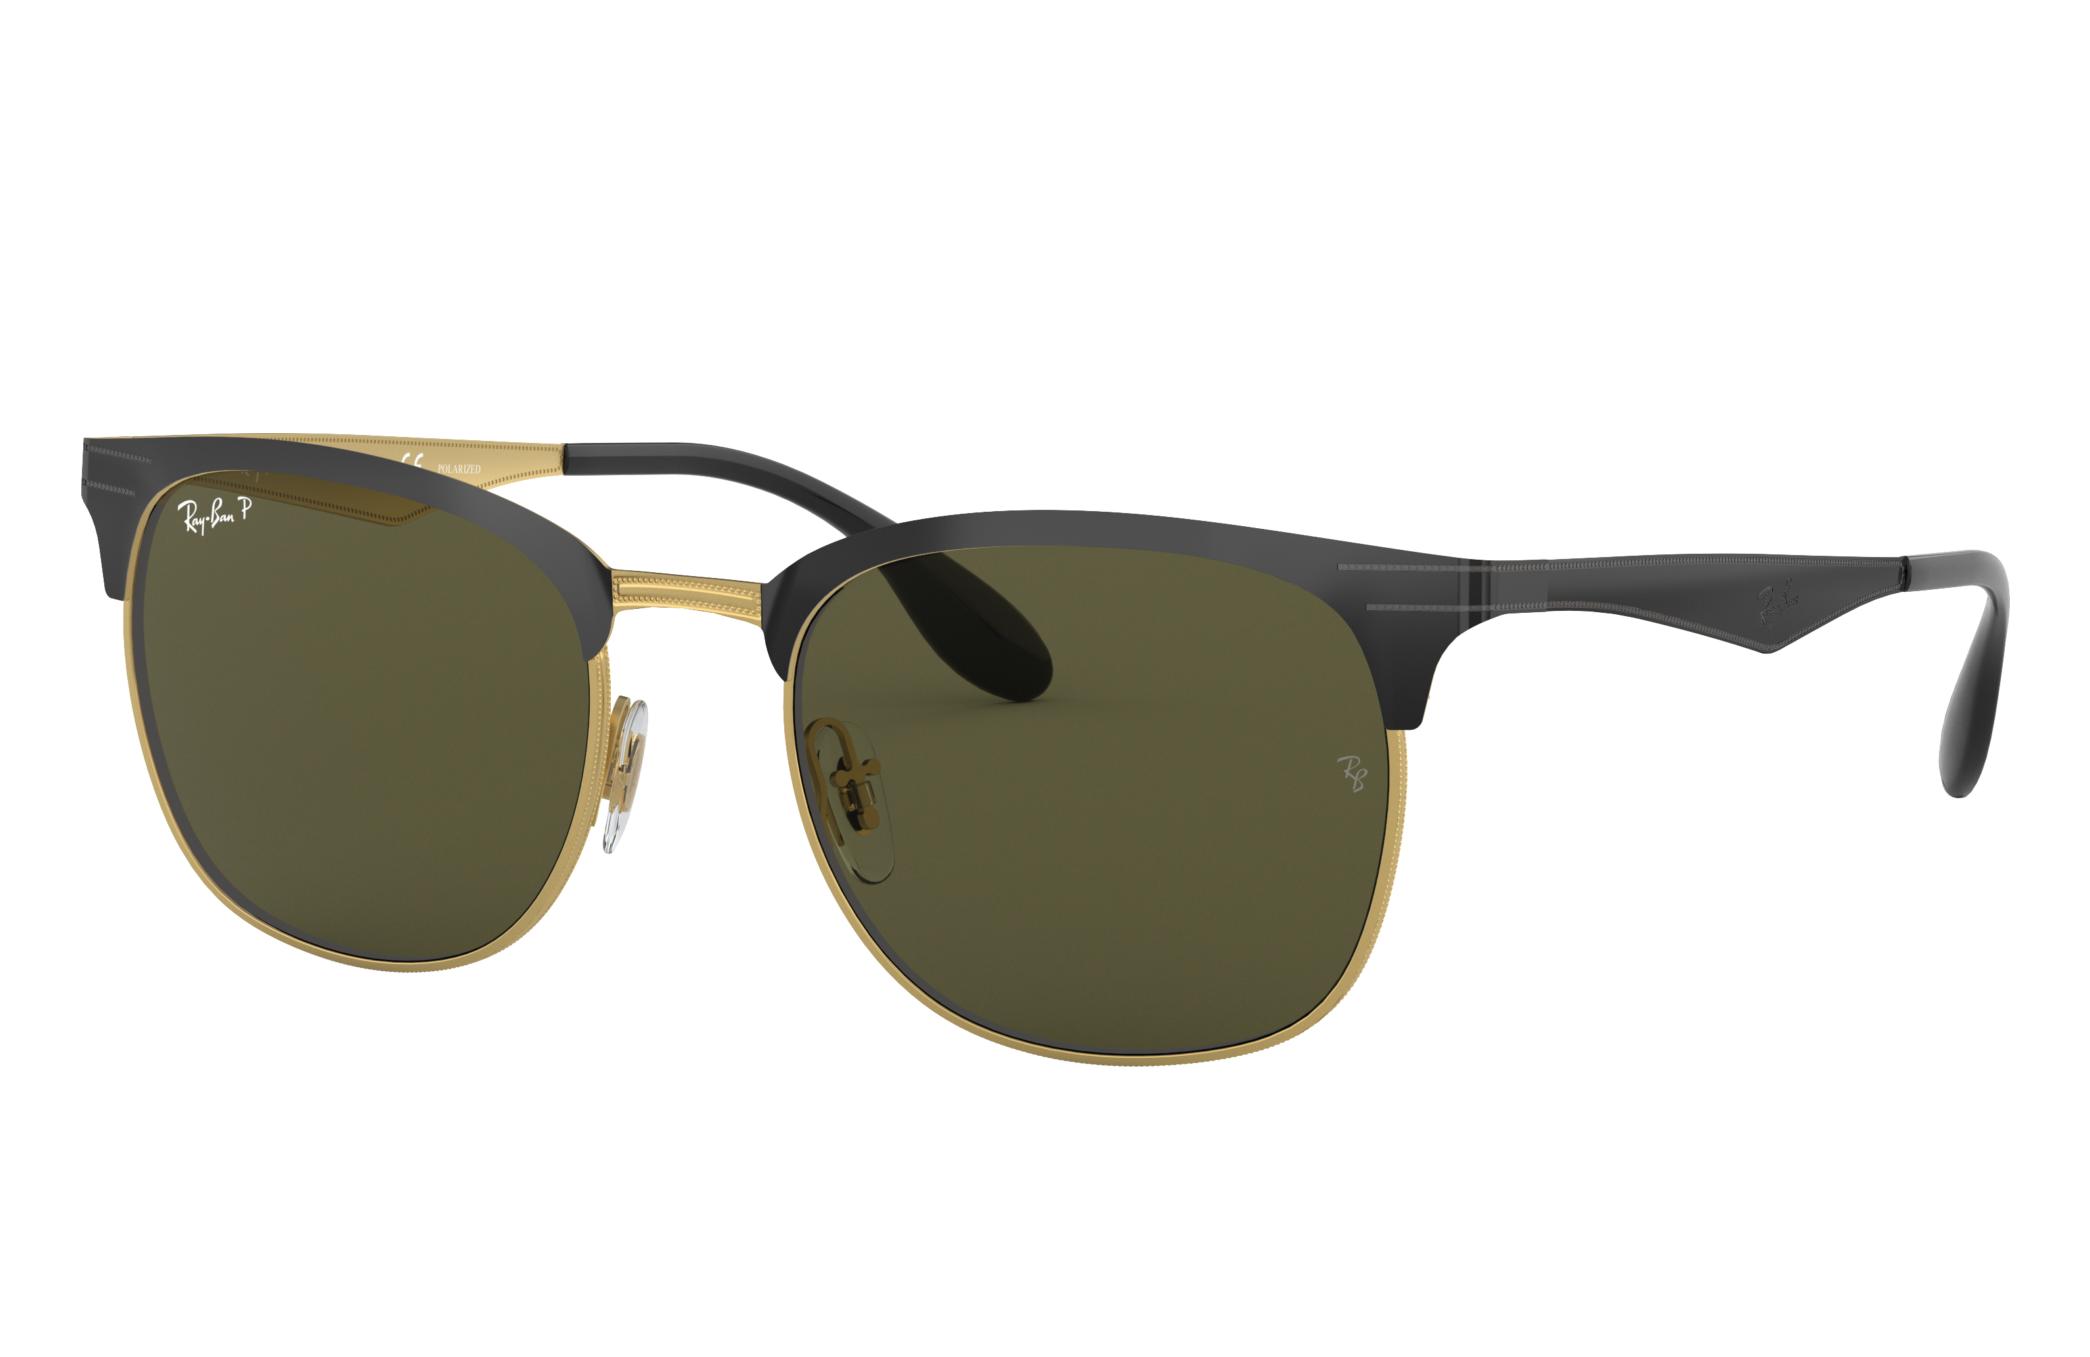 Ray-Ban Rb3538 Black, Polarized Green Lenses - RB3538